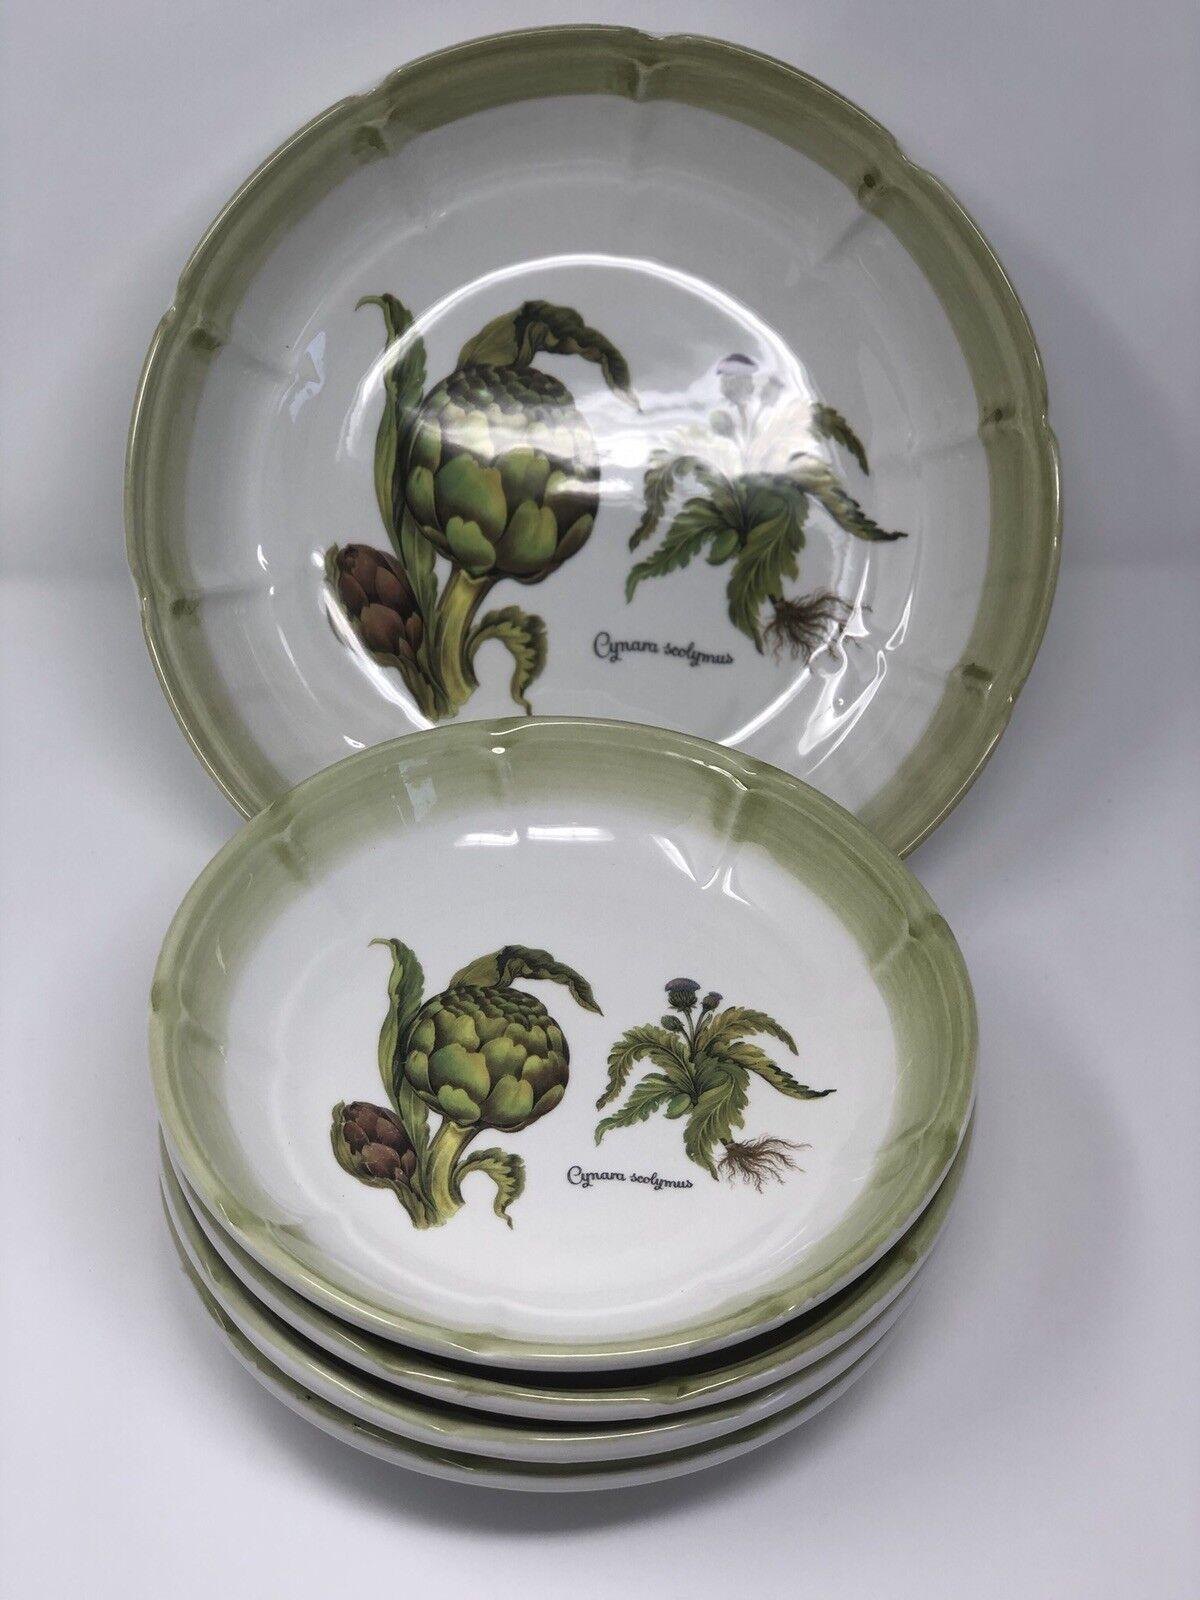 Bowl Set 5 Piece Large Serving Pasta  Ceramic